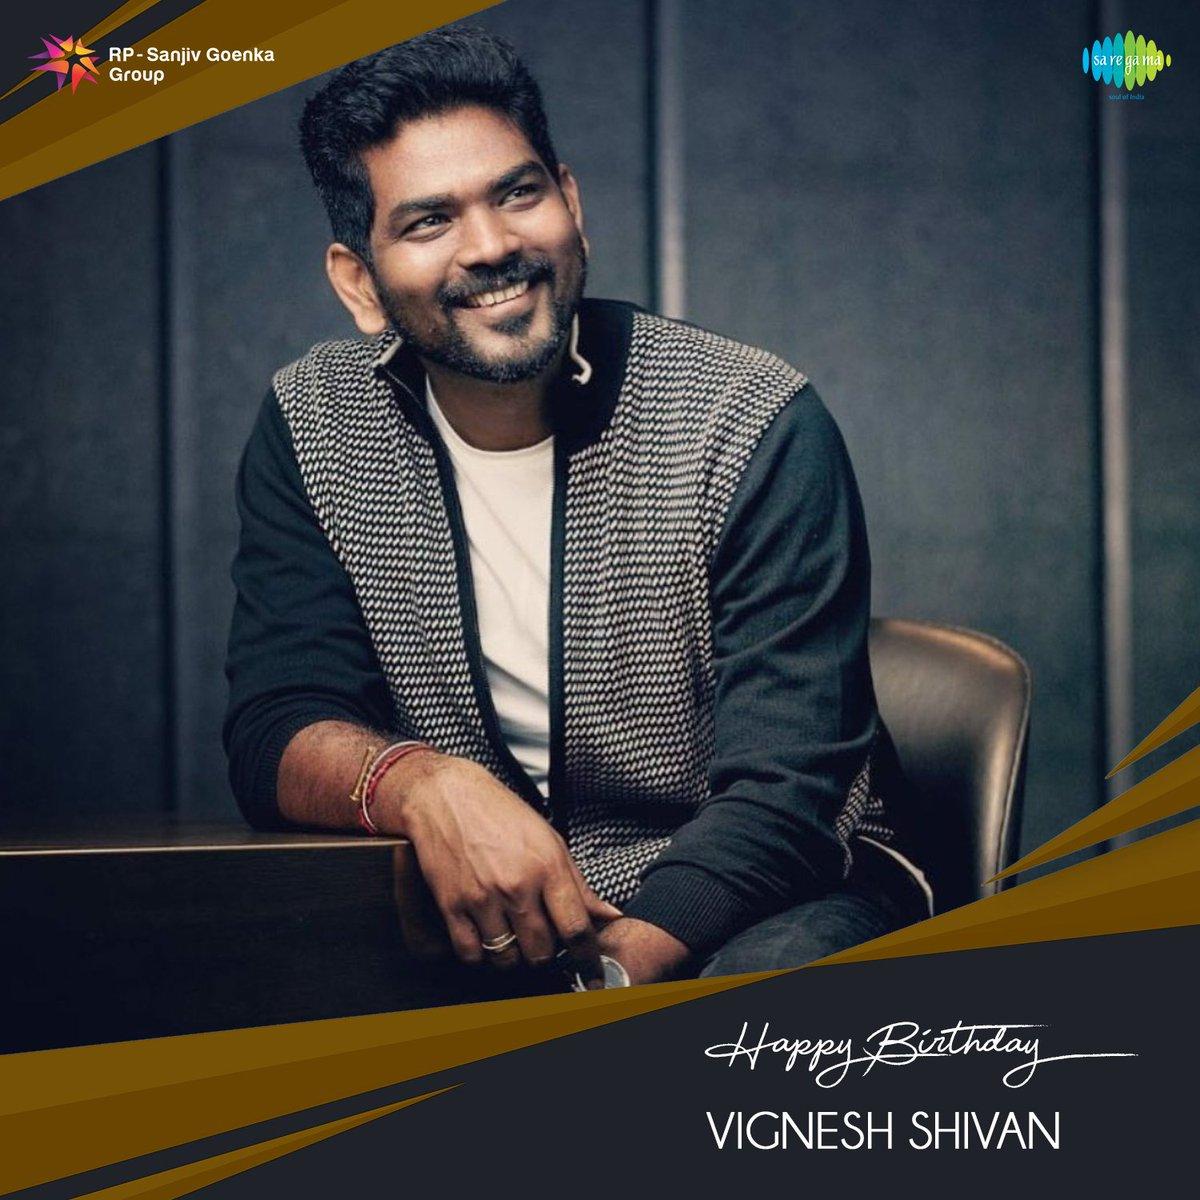 Birthday wishes to the extremely talented @VigneshShivN    #SaregamaWishes #HBDVigneshShivan #HappyBirthdayVigneshShivan #HBDVigneshShivN https://t.co/f54iJsBktf